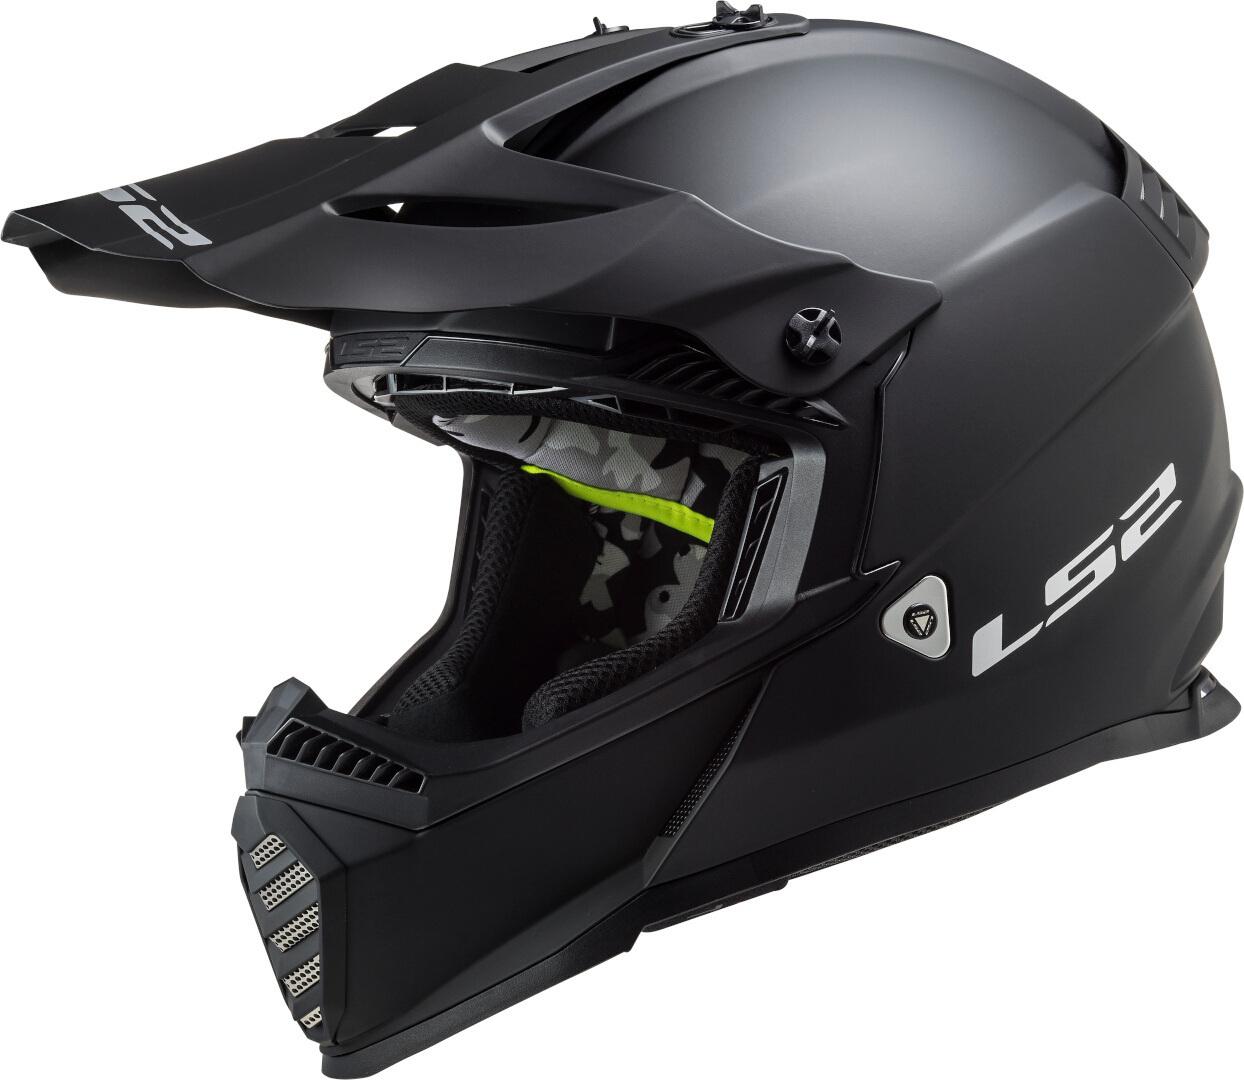 LS2 MX437 Fast Evo Solid Motocross Helm, schwarz, Größe 2XS, schwarz, Größe 2XS